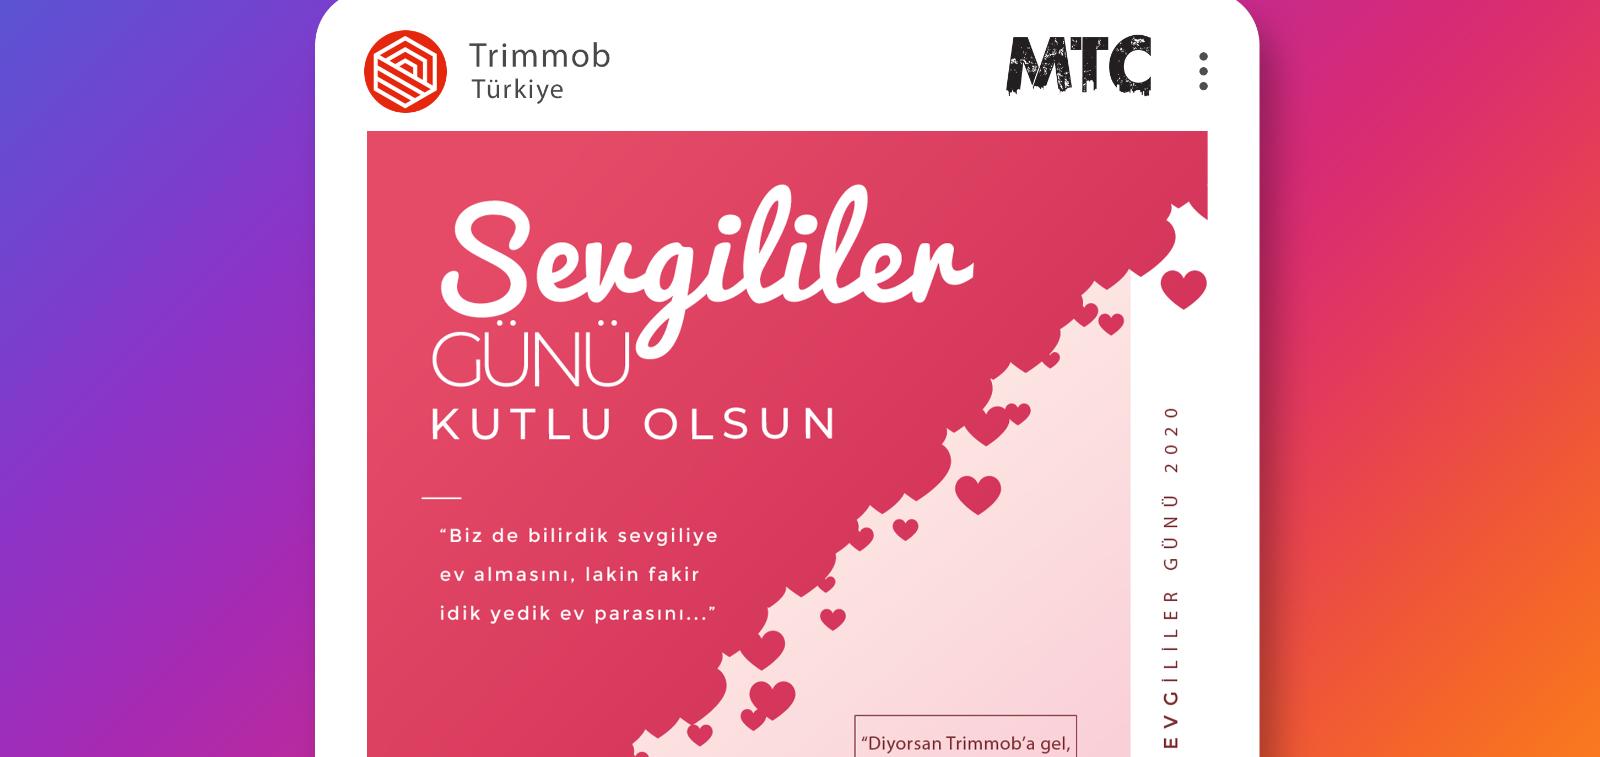 tzn_mhmmd